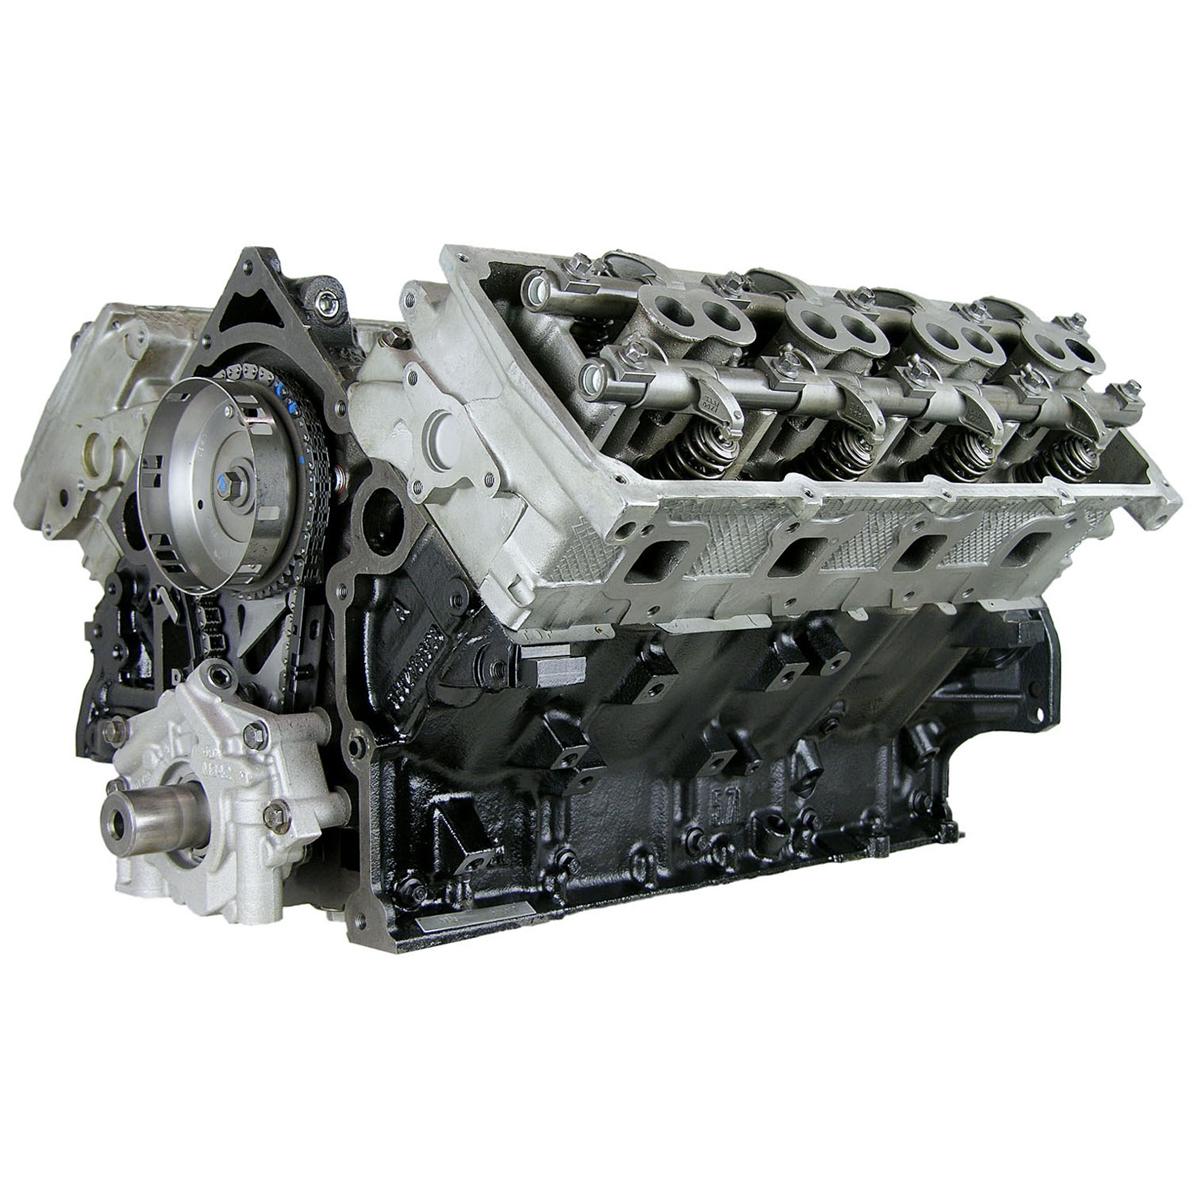 atk hp103 gen iii hemi 5 7l 400hp crate engine mix ram 5 7 hemi engine [ 1200 x 1200 Pixel ]